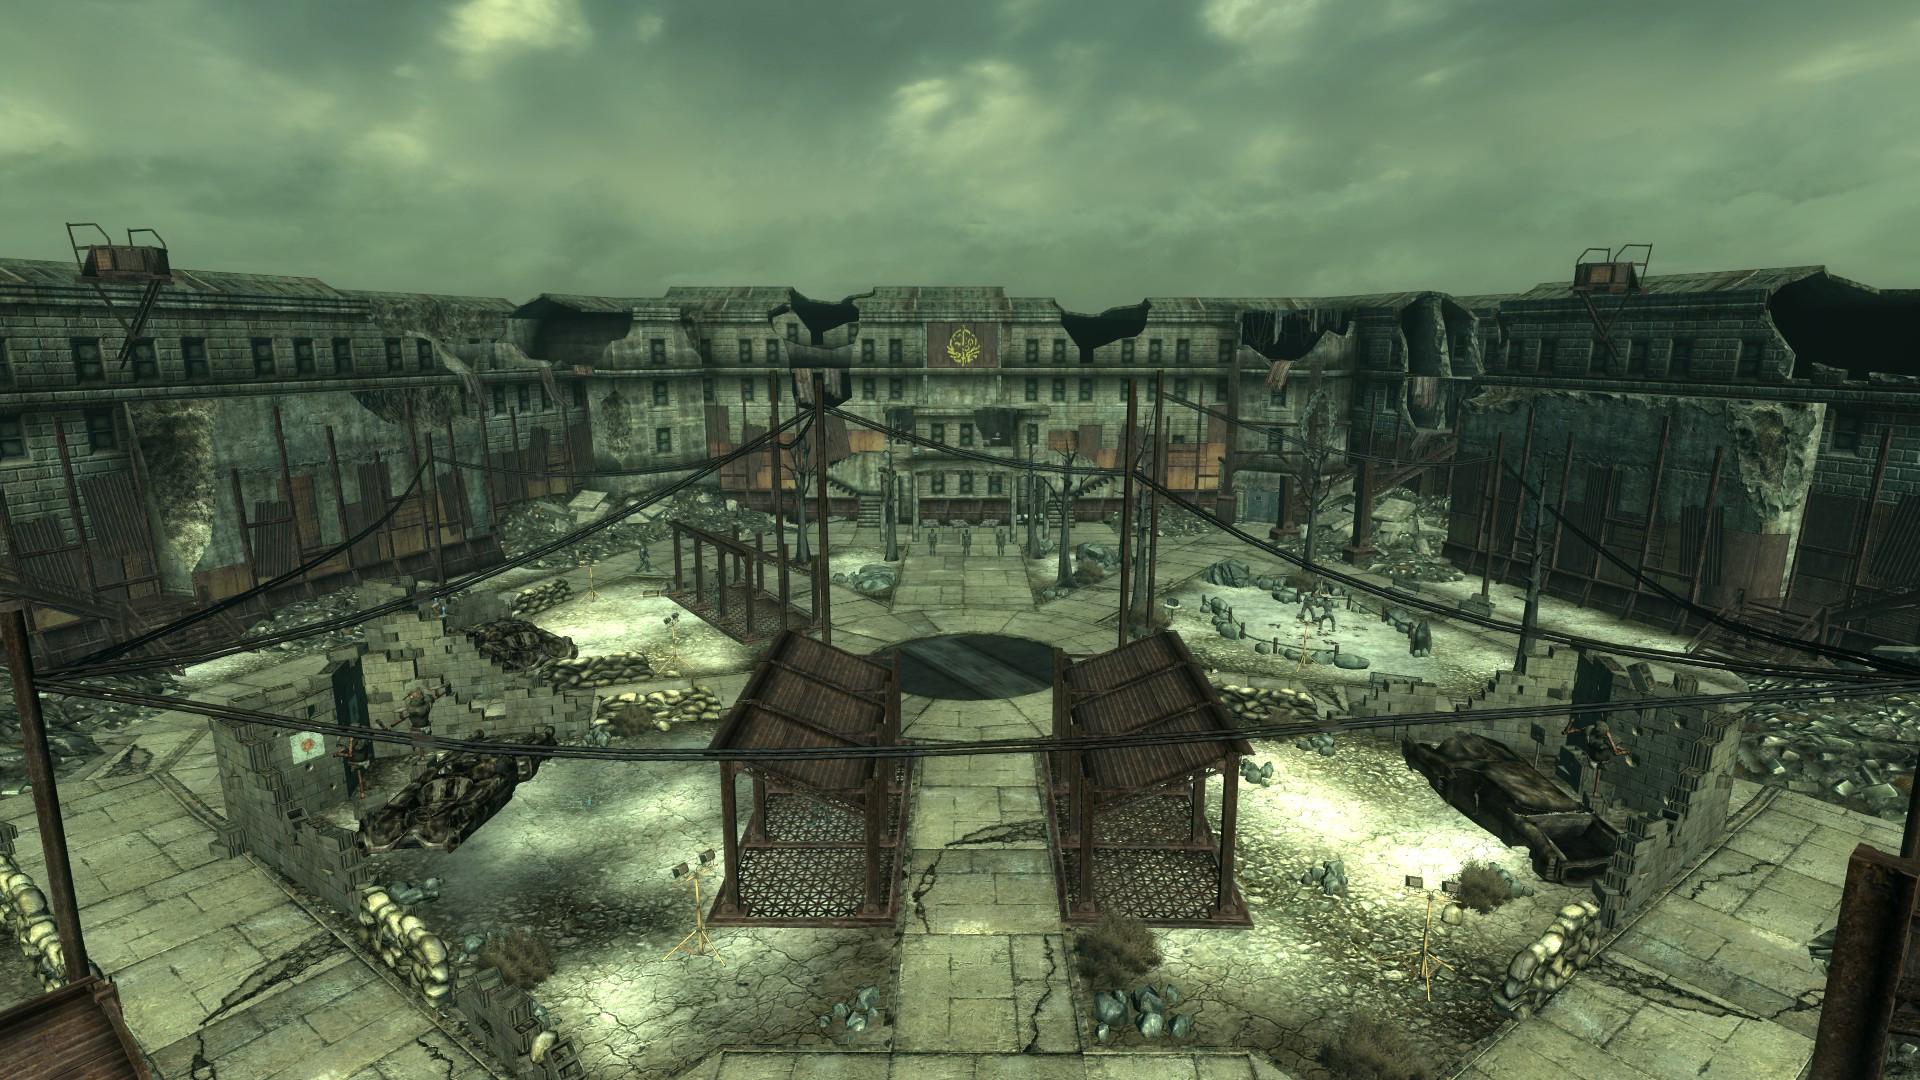 Citadel bailey   Fallout Wiki   FANDOM powered by Wikia